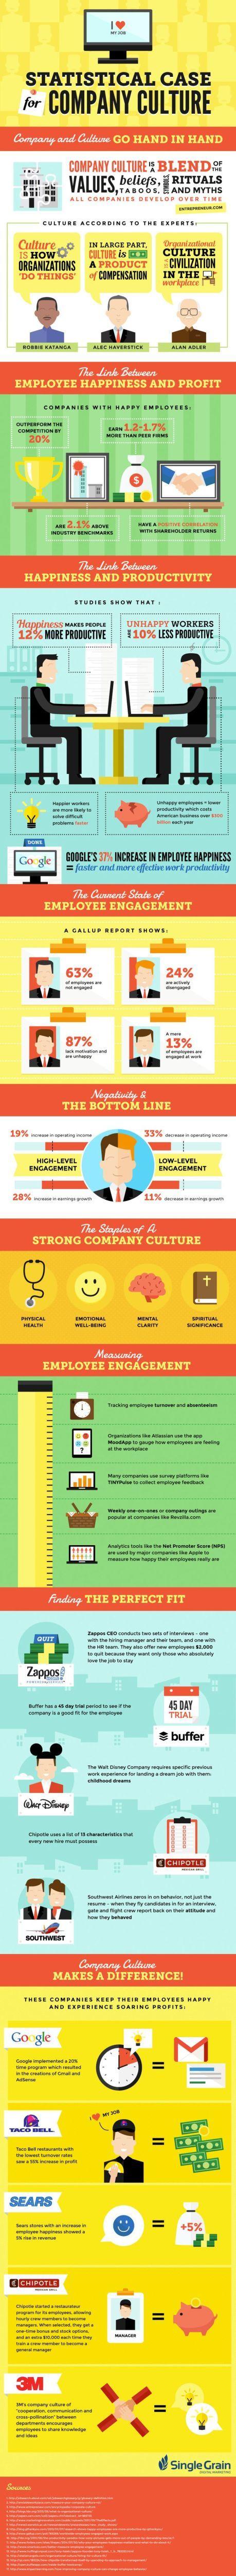 Unternehmenskultur saatkorn